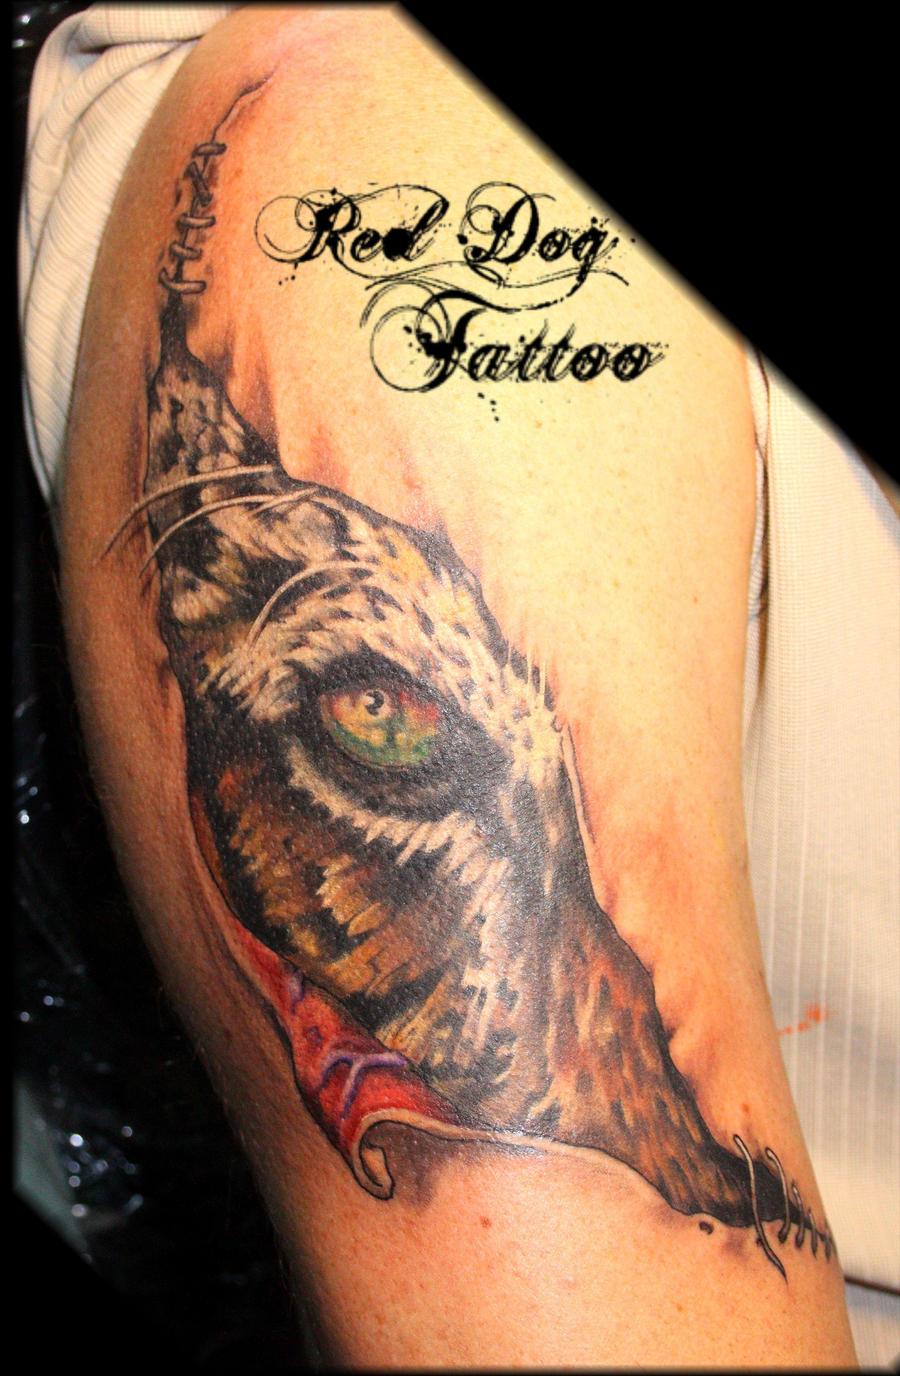 Johns tiger tattoo by reddogtattoo on deviantart for Under the skin tattoo